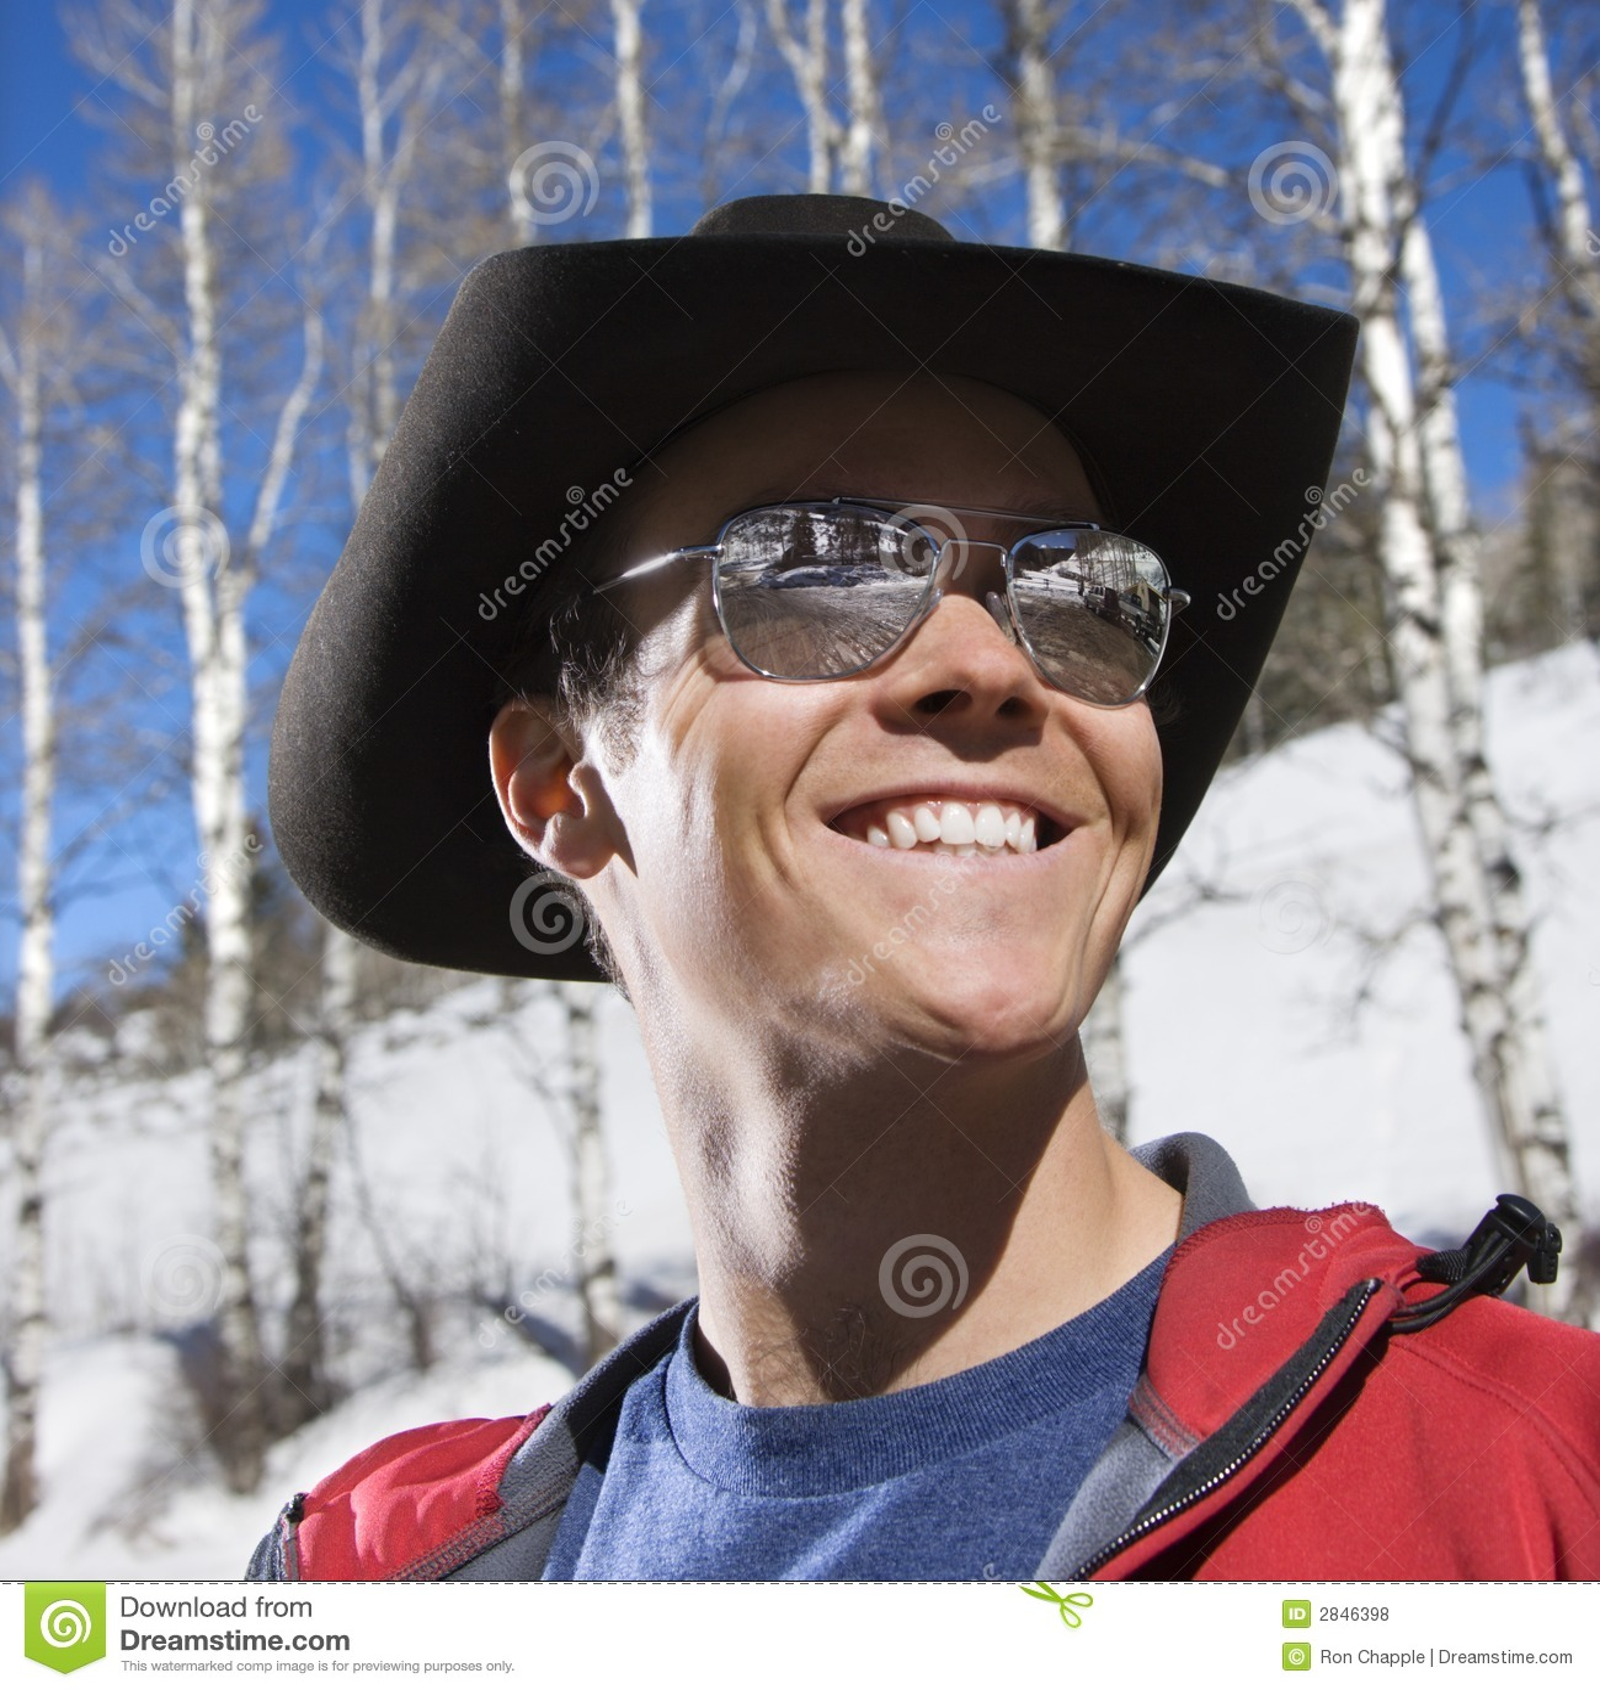 Man wearing cowboy hat. stock photo. Image of square 427b419e82b6